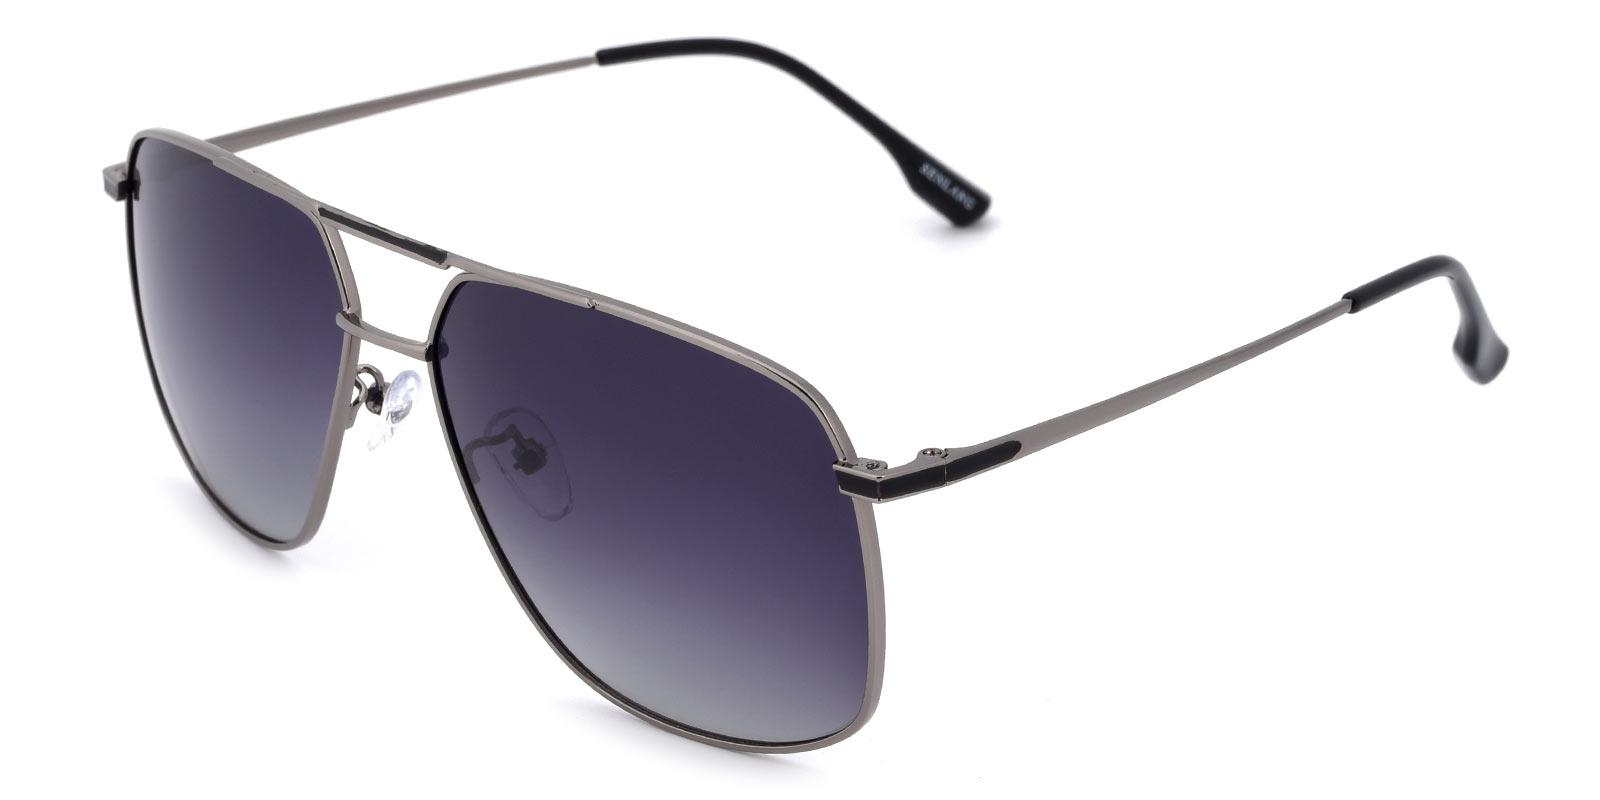 Apollo-Gun-Aviator-Metal-Sunglasses-detail